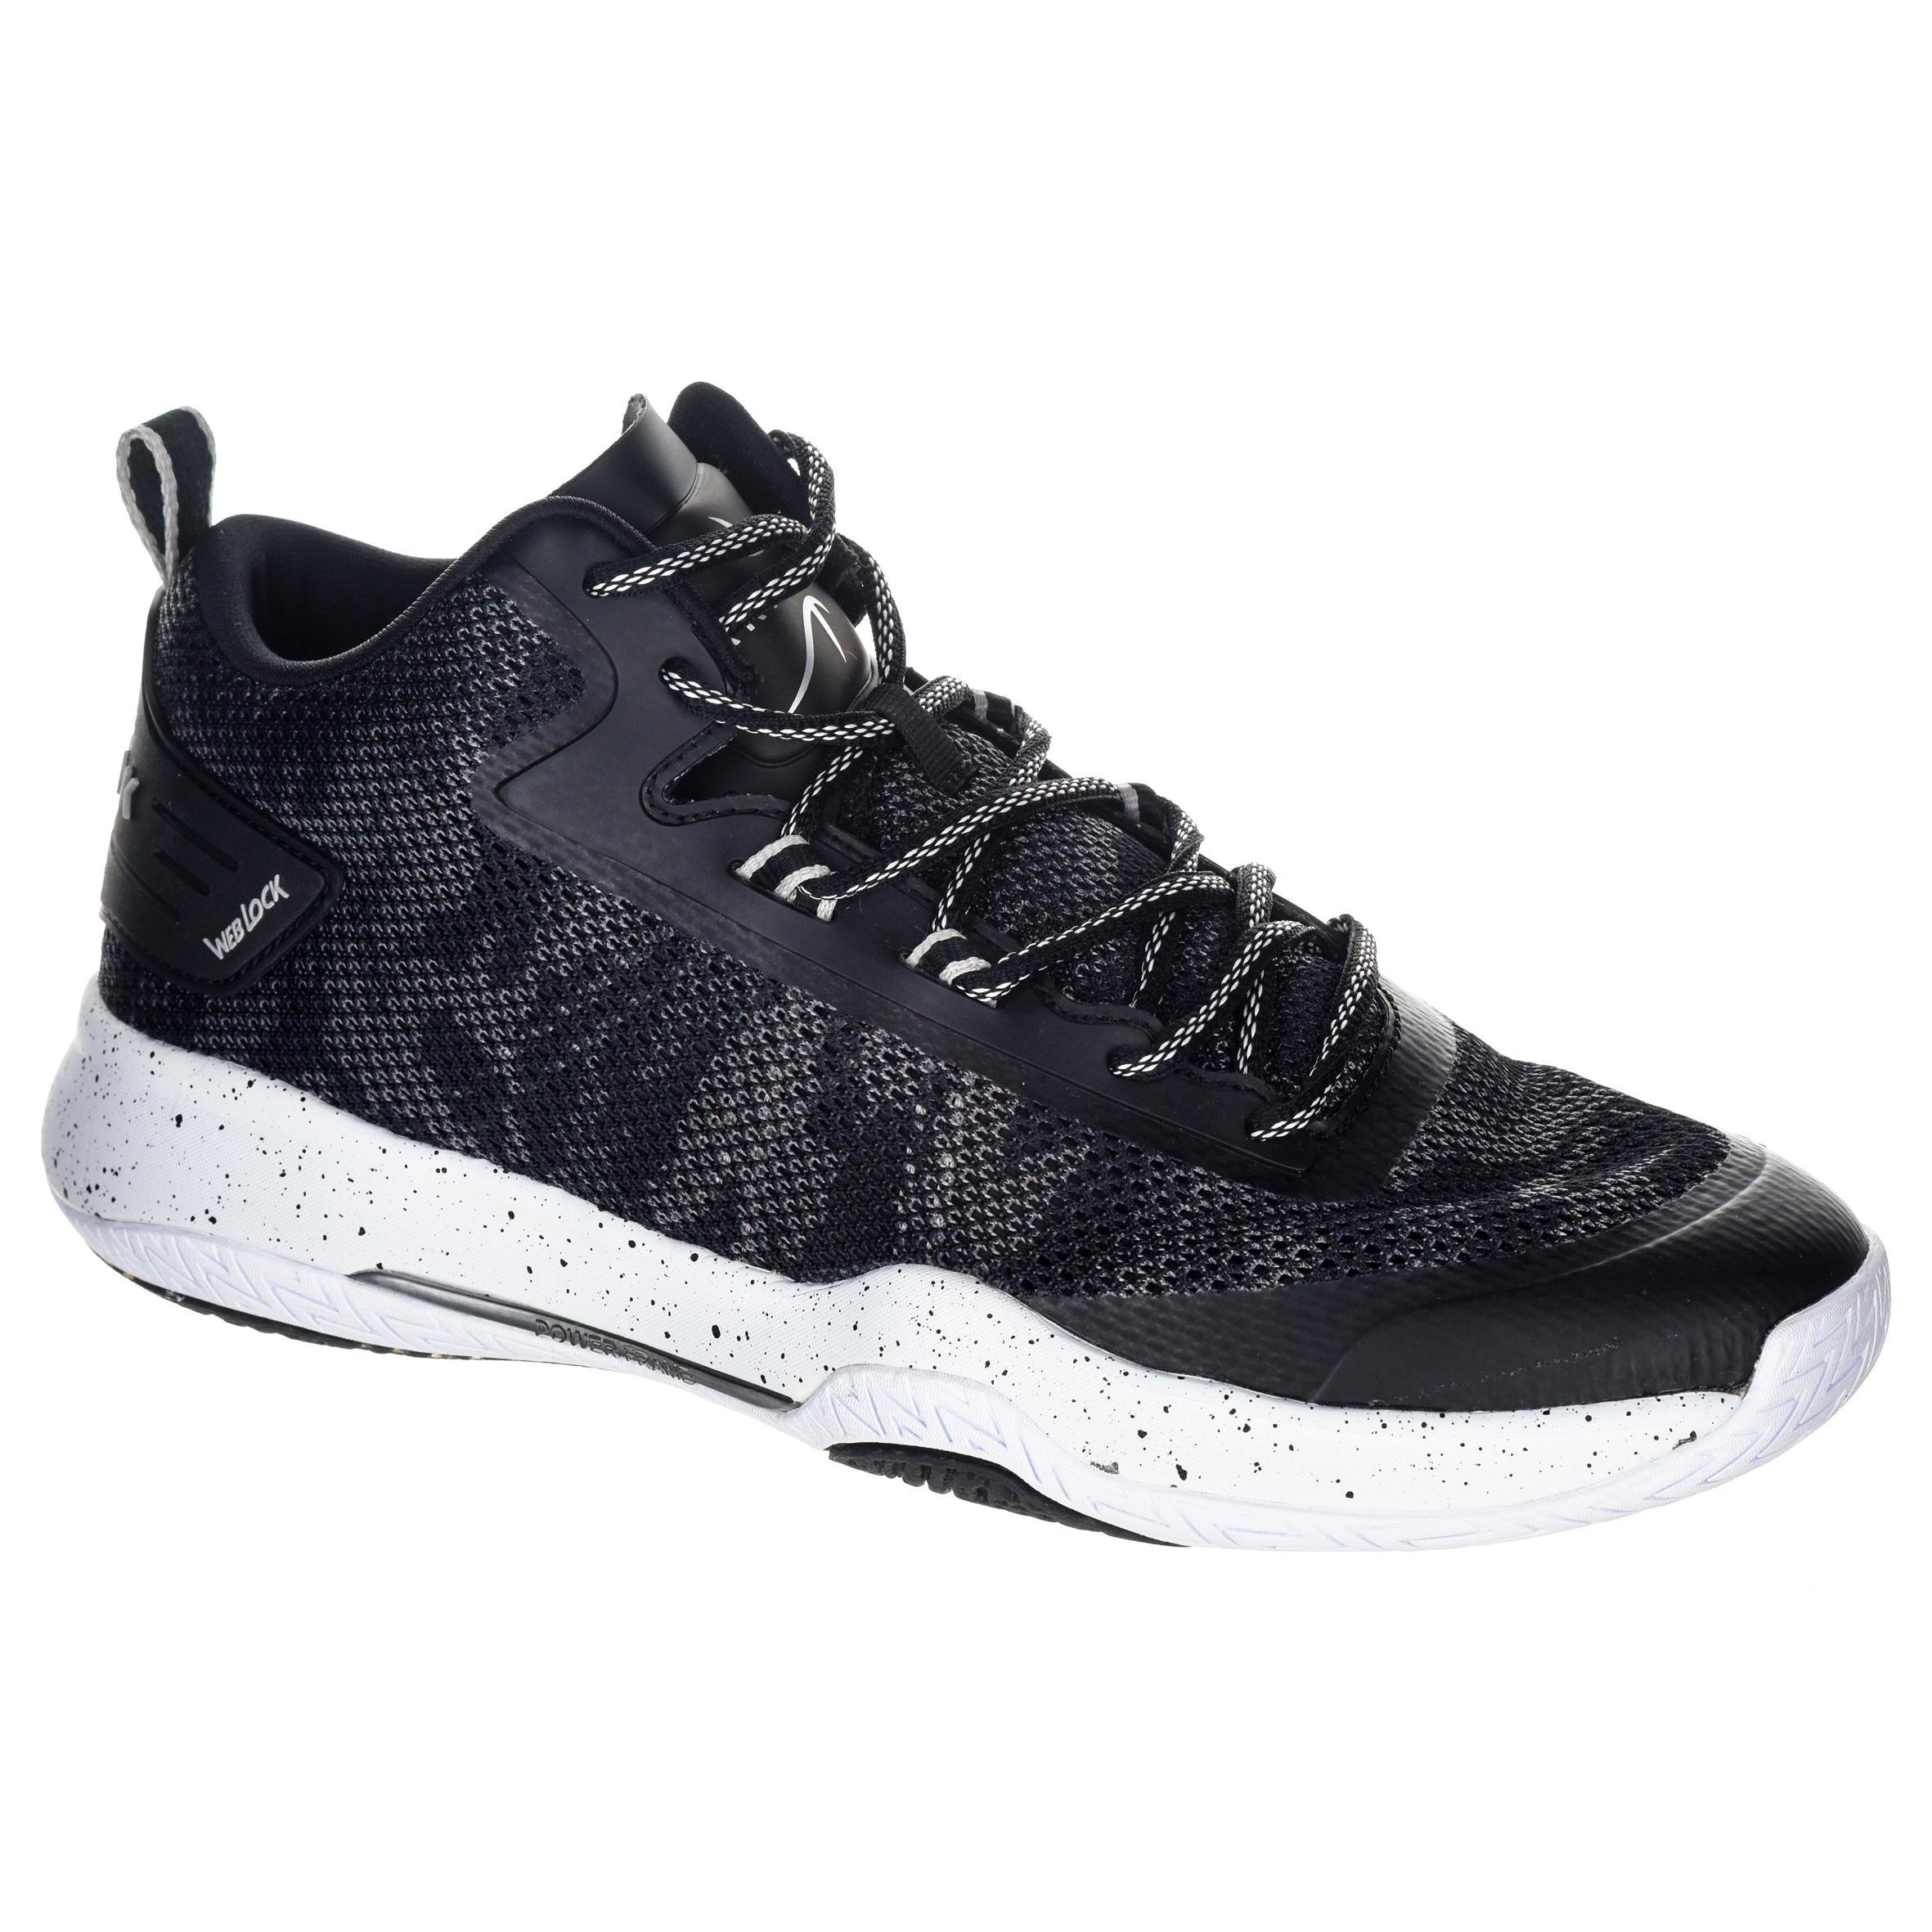 2586021 Tarmak Basketbalschoenen volwassenen H/D halfgevorderden SC 500 mid zwart wit